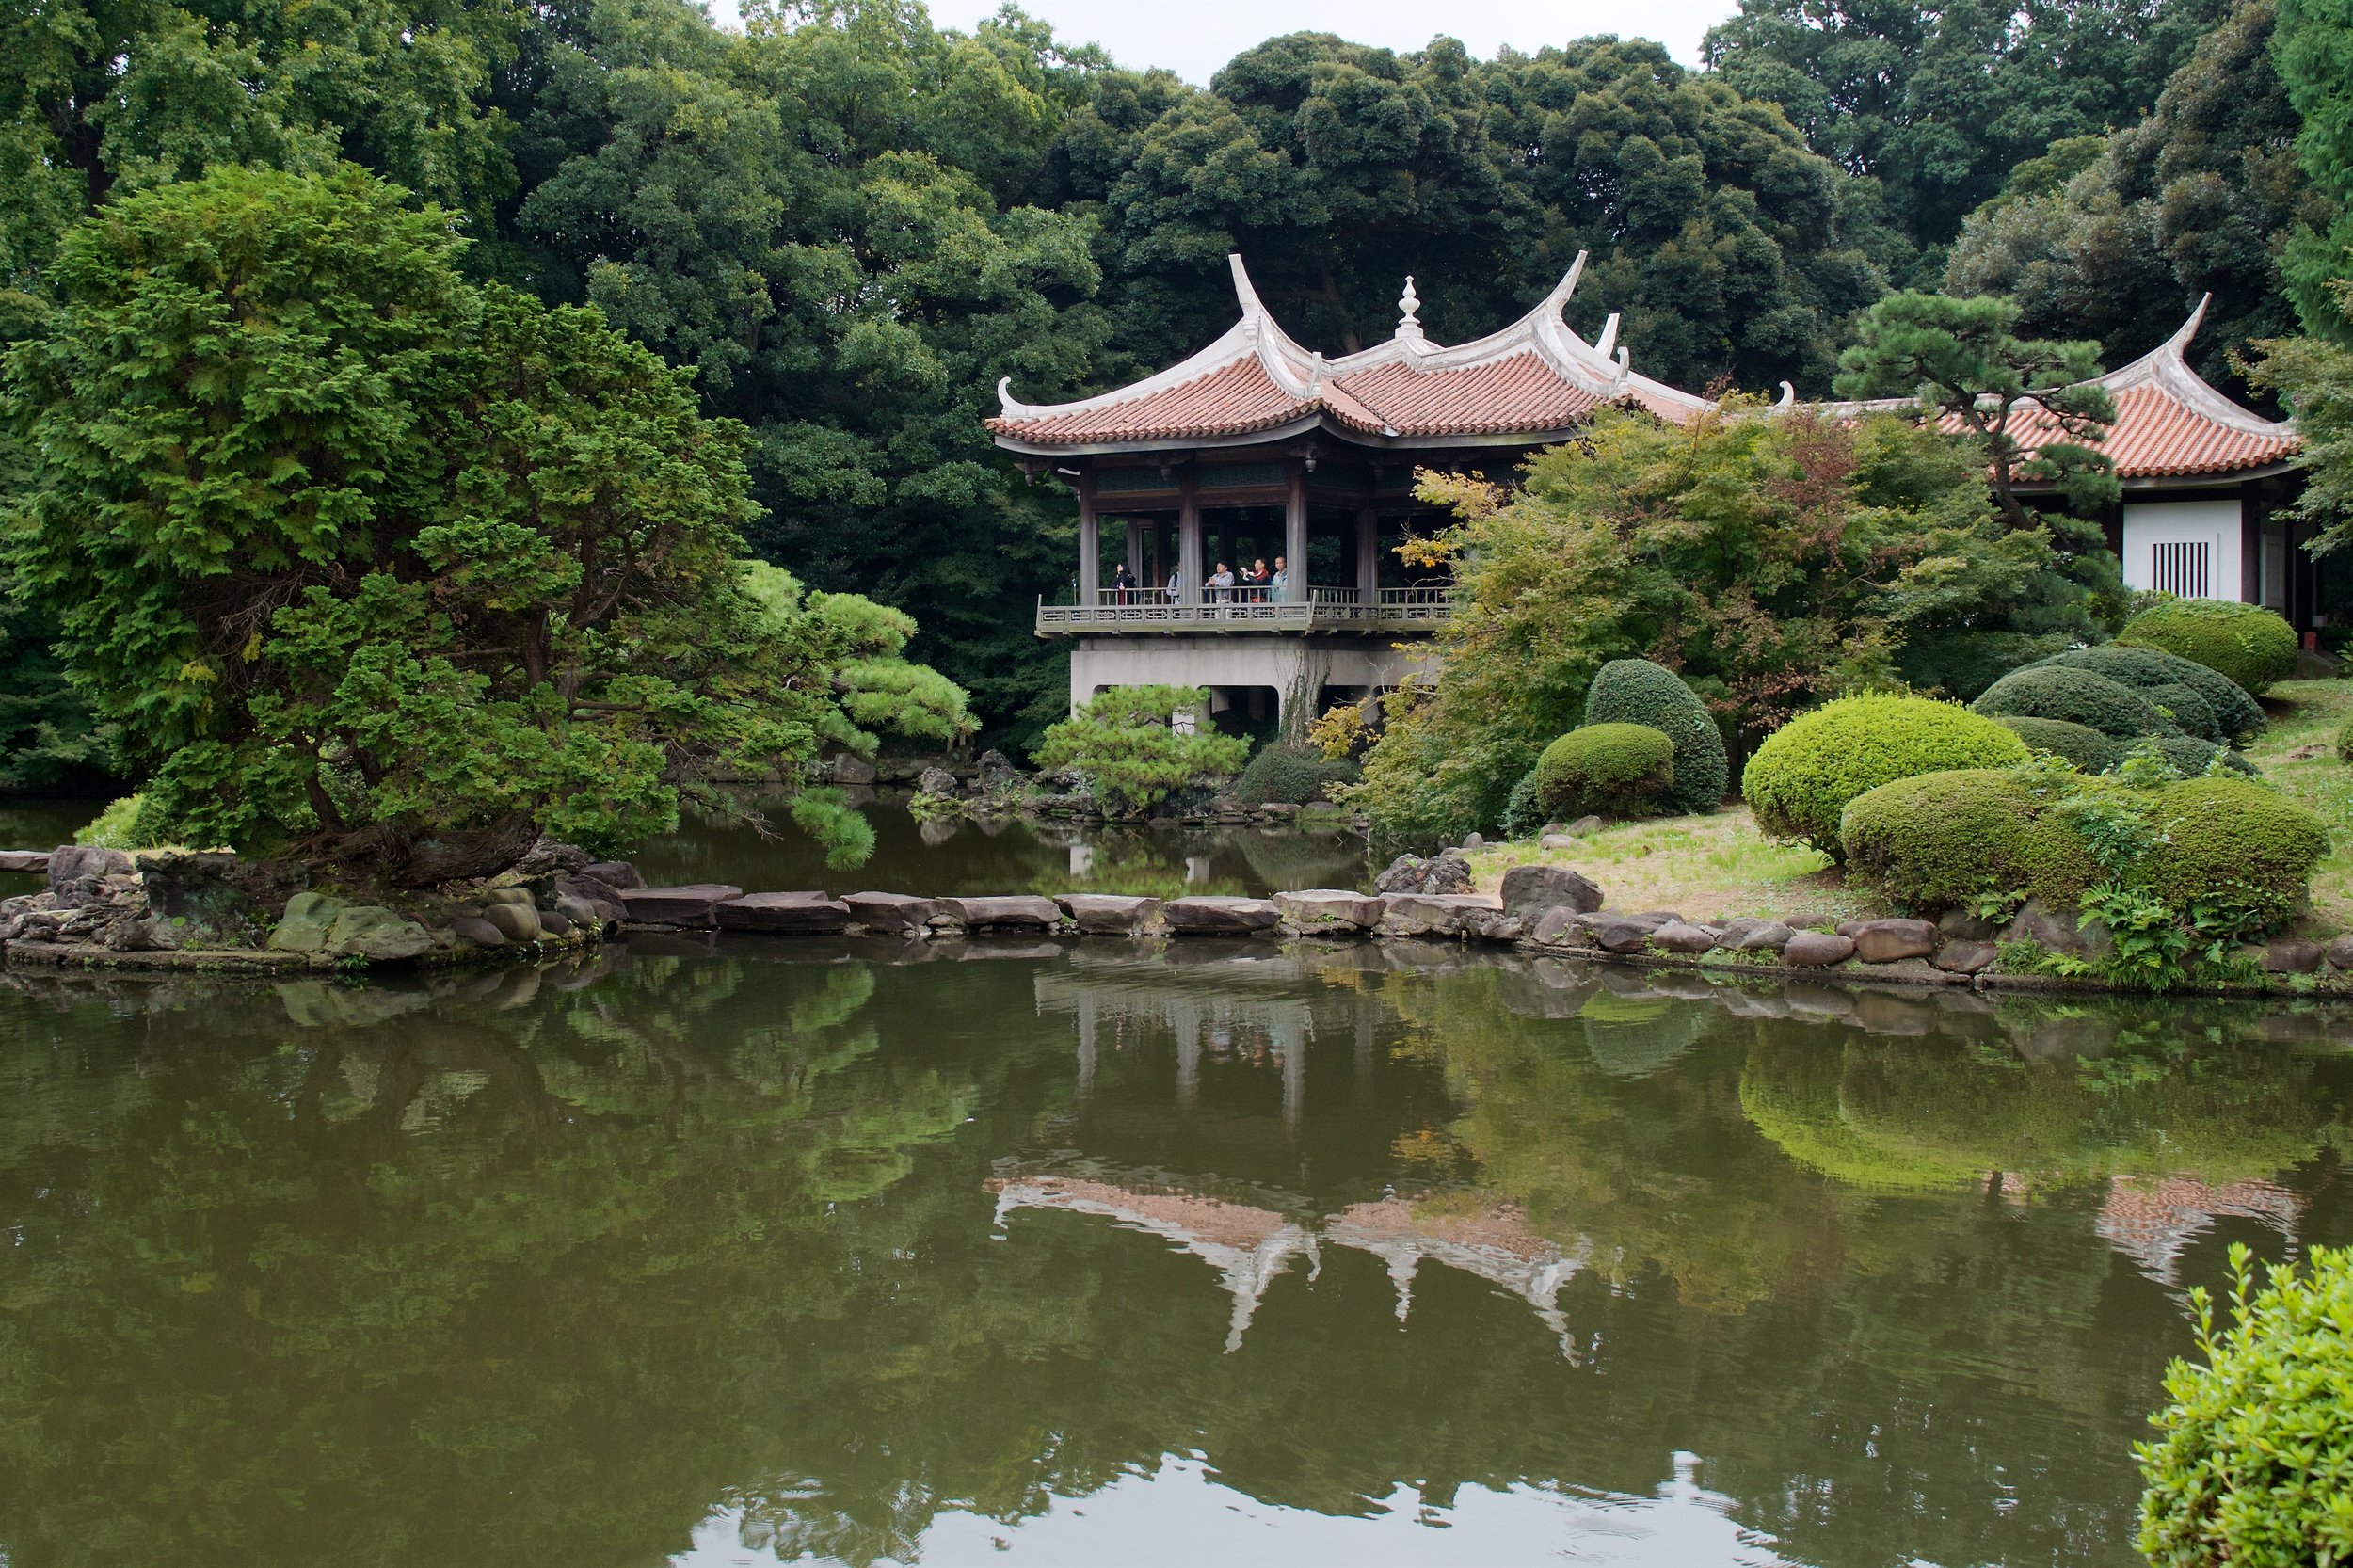 Taiwan Pavilion, upper pond